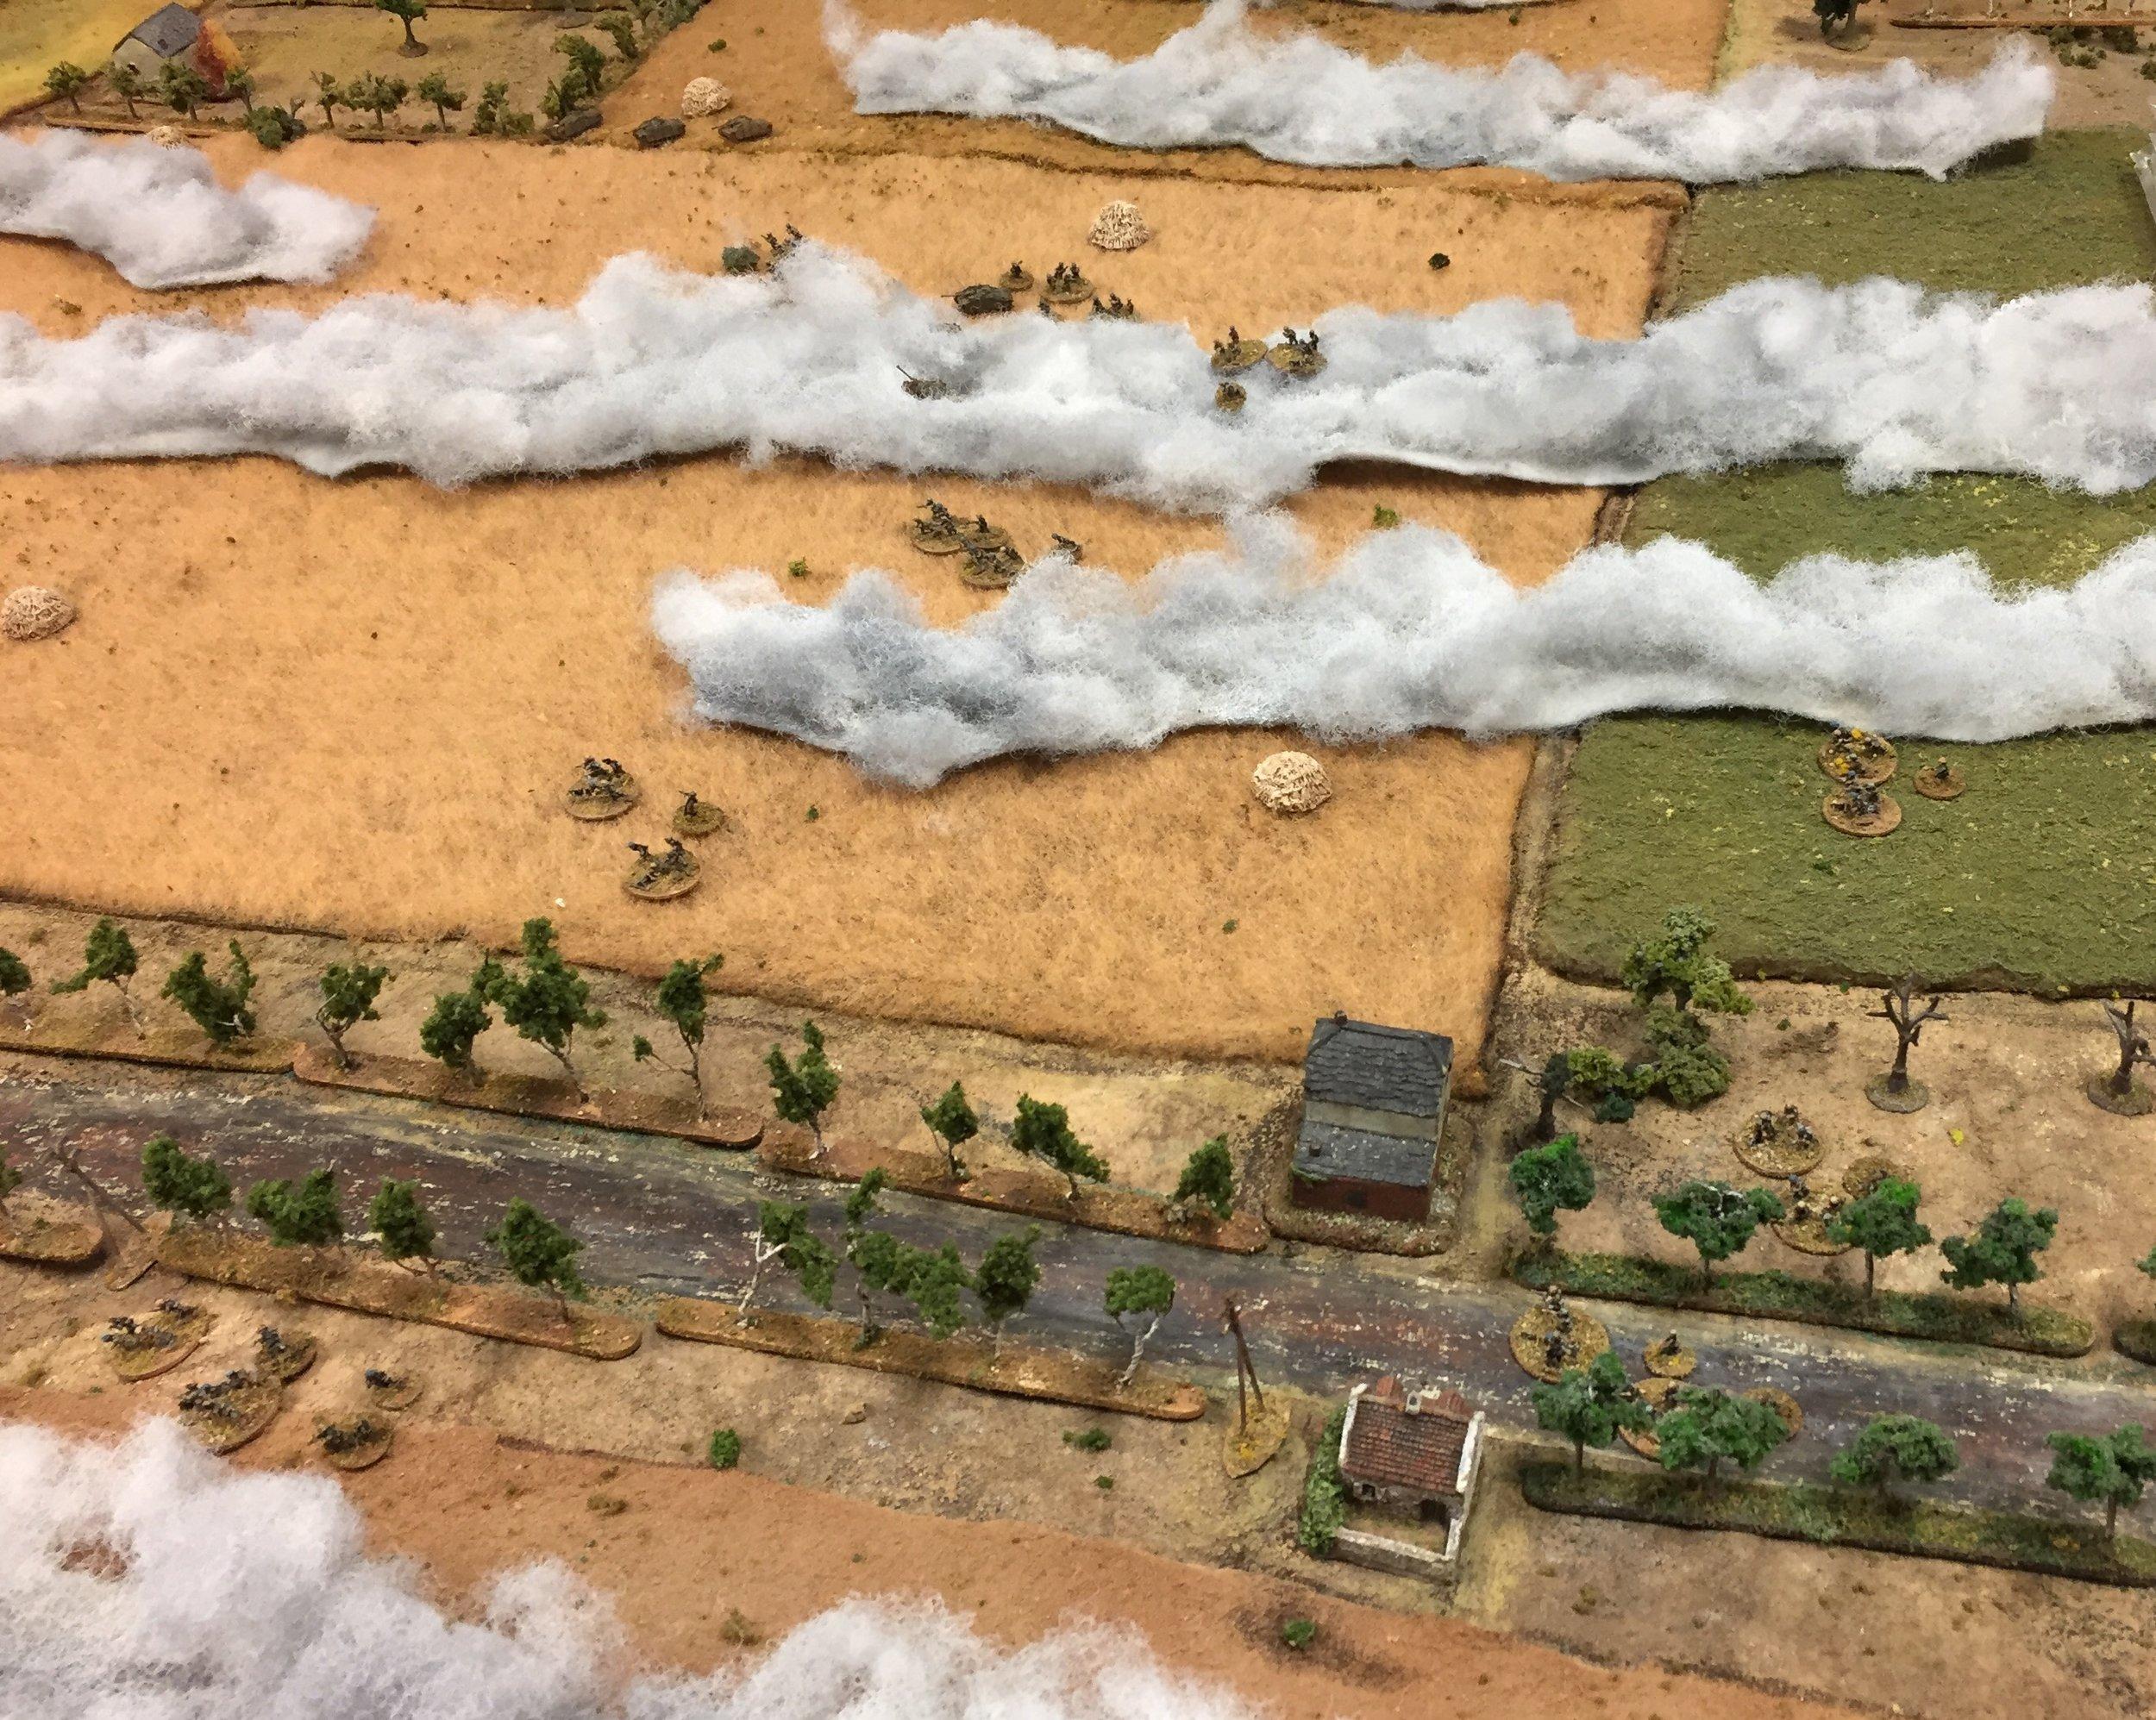 Luftwaffe Crosses the Road